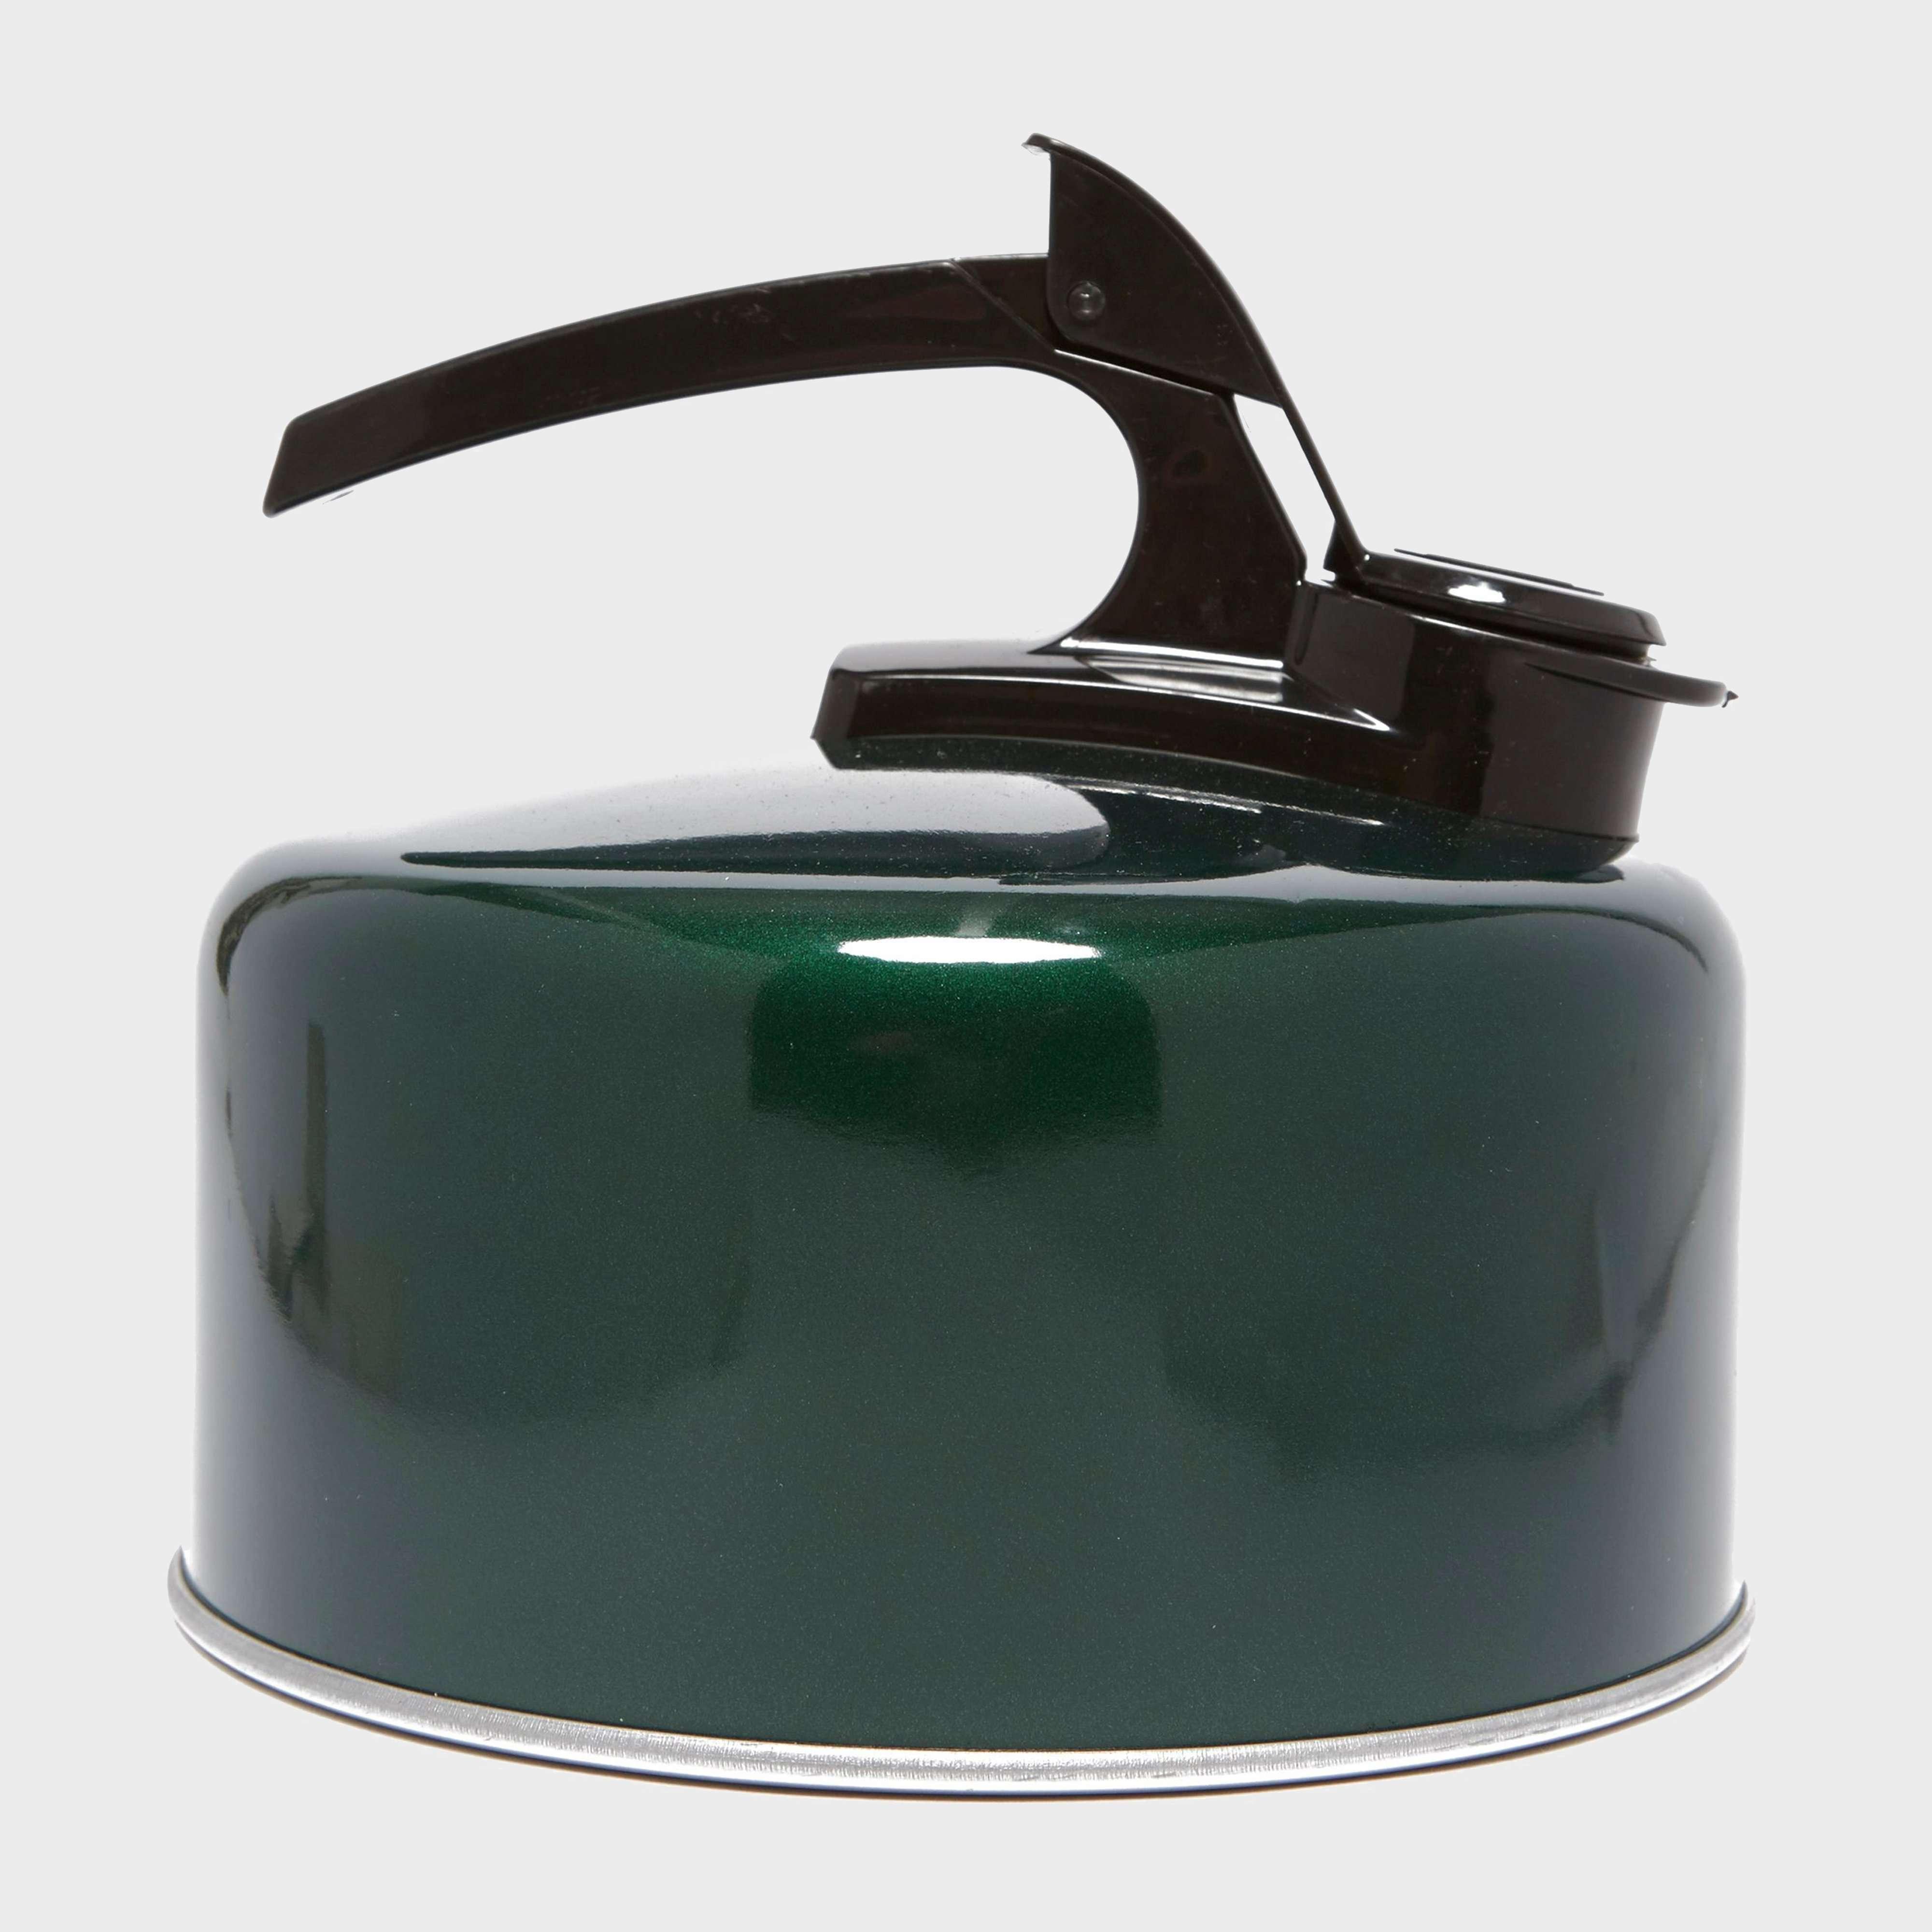 EUROHIKE Whistle Kettle - 2L